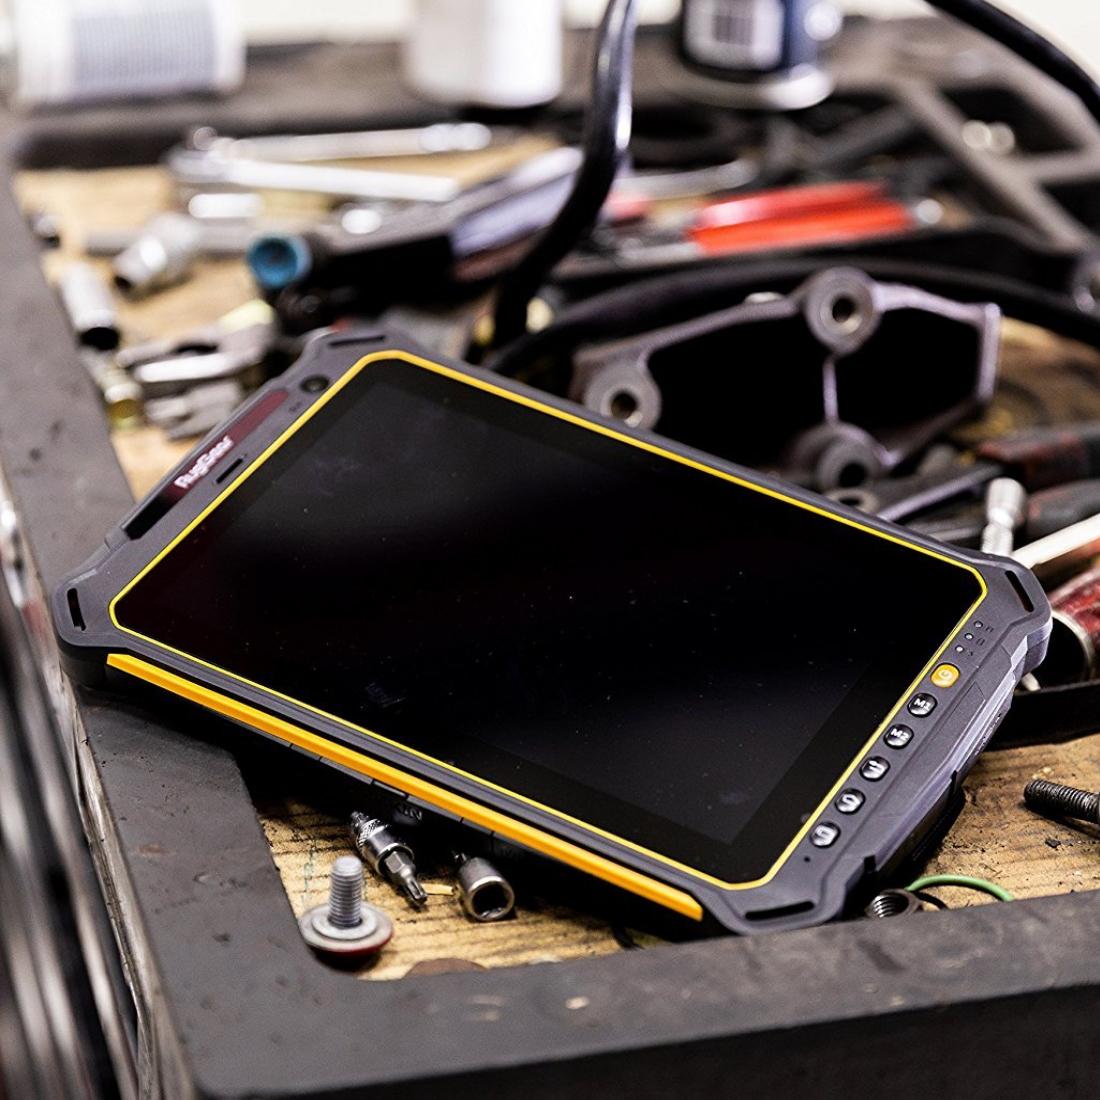 tableta ruggear rg910 80 32gb 3gb ram lte ip68 rg910 black